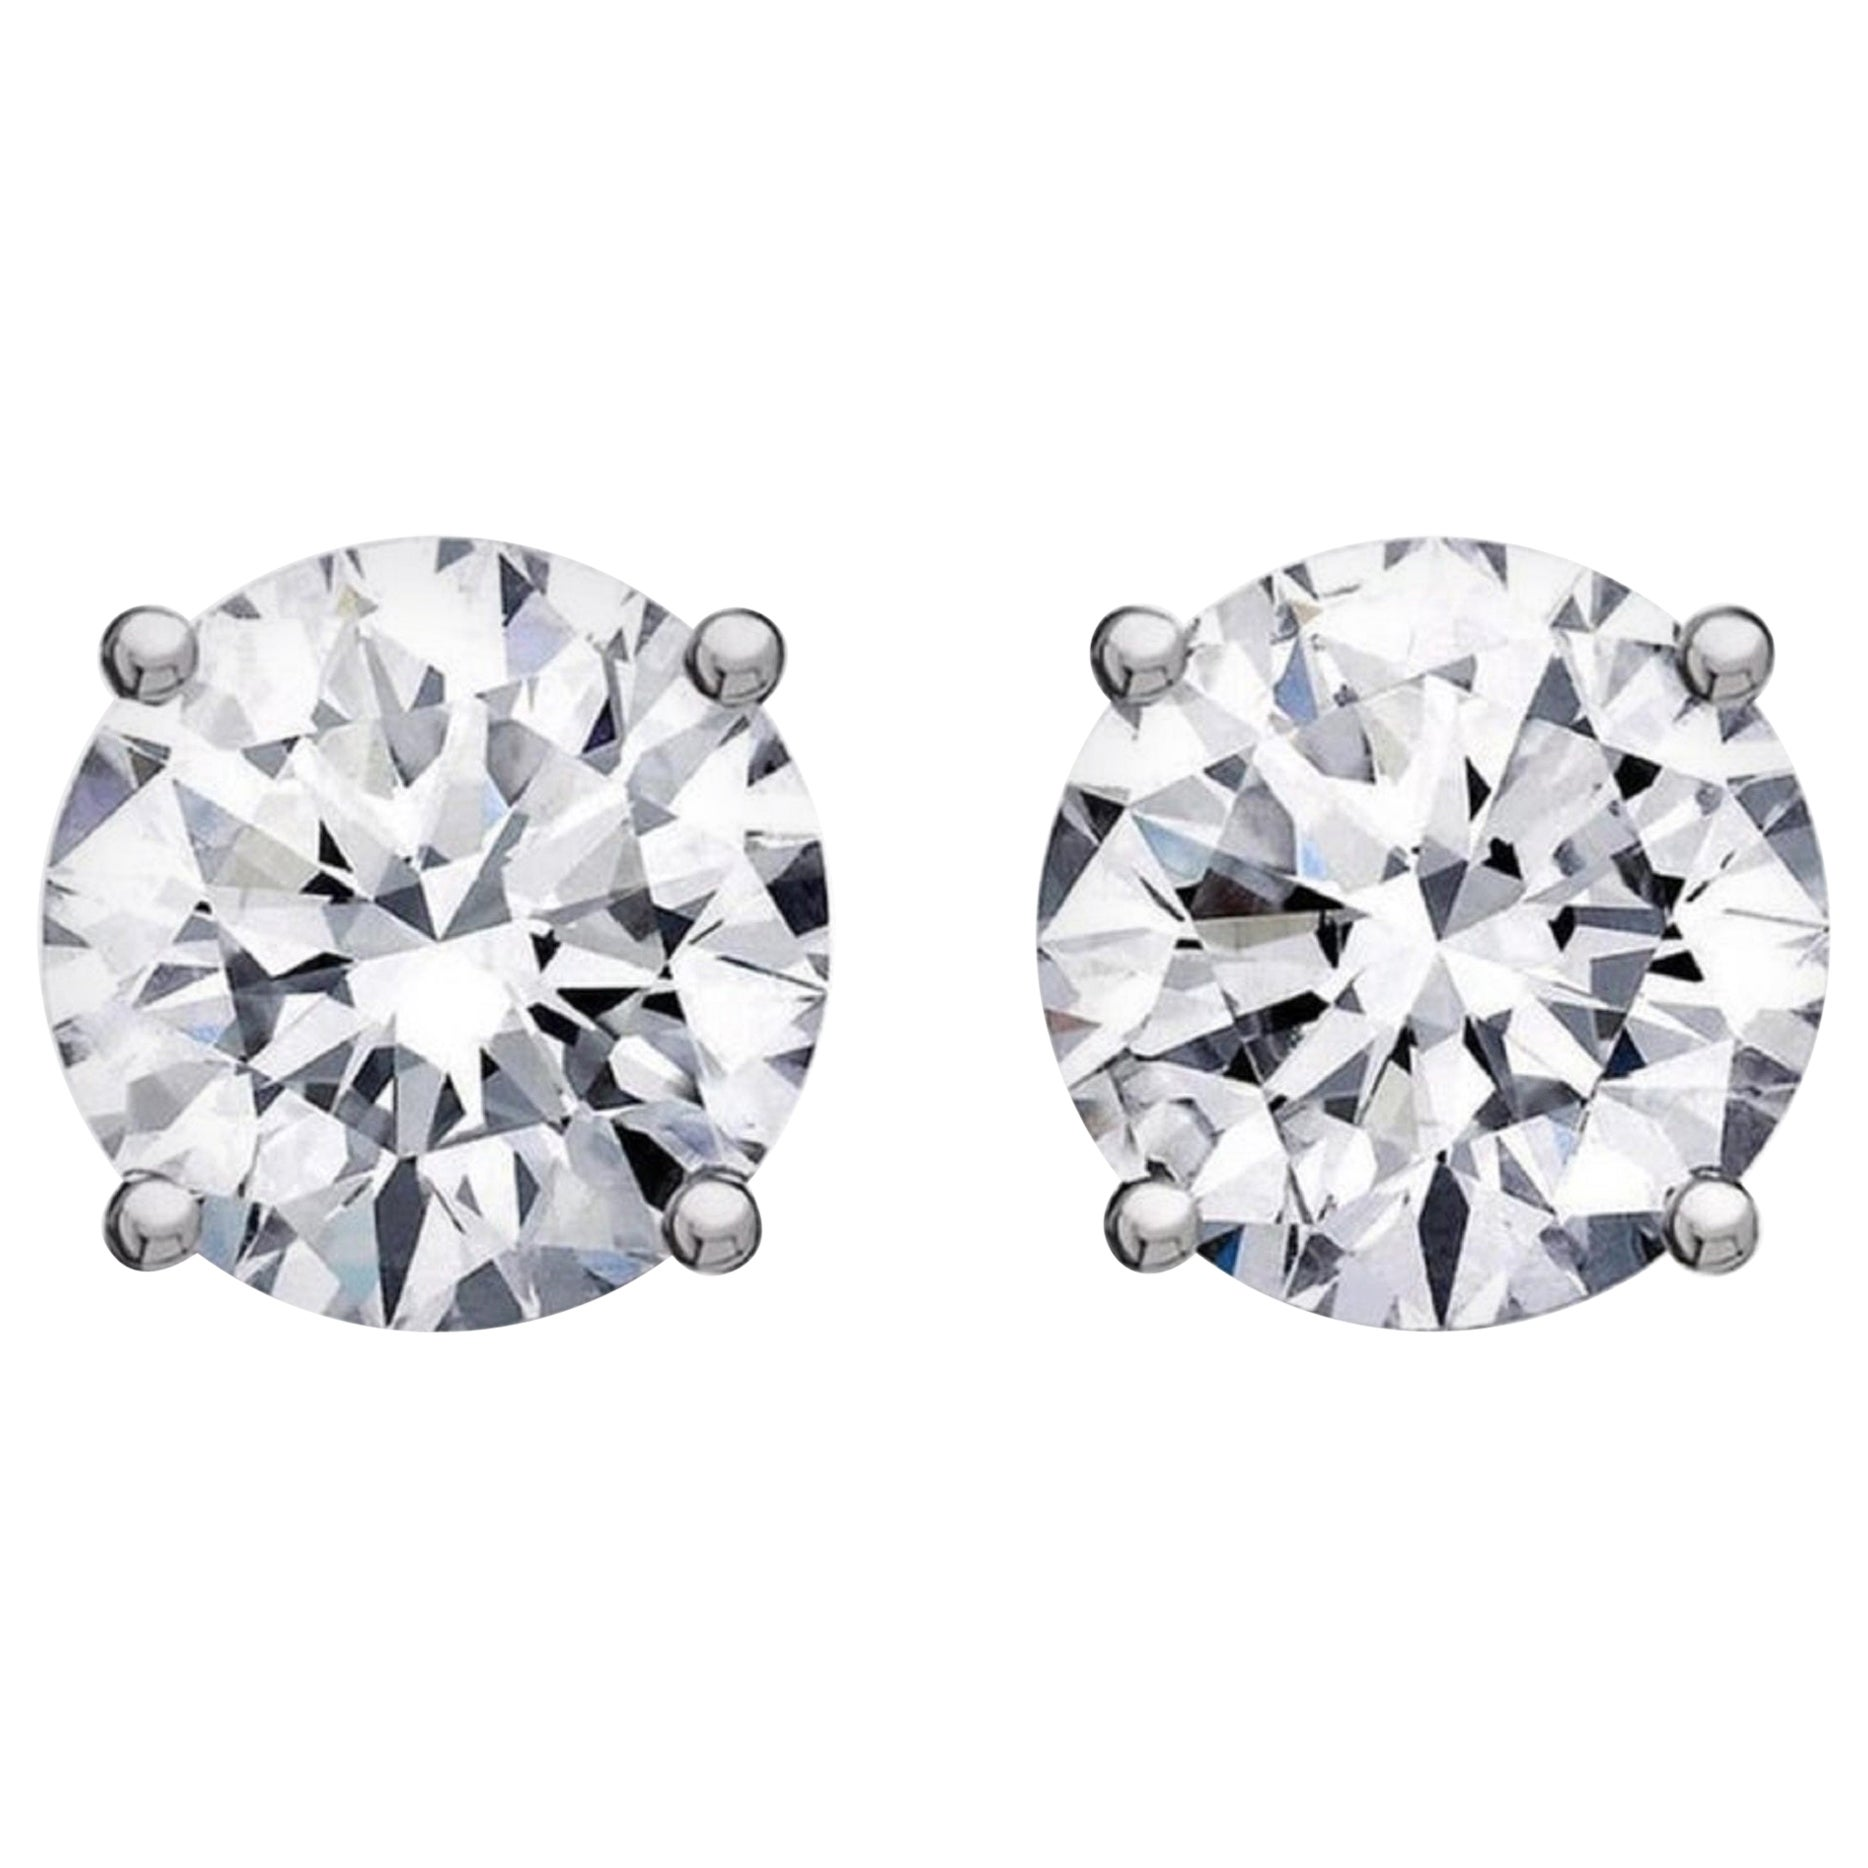 GIA Certified 4.02 Carat Certified Brilliant Cut Diamond Studs H  VS1 Clarity